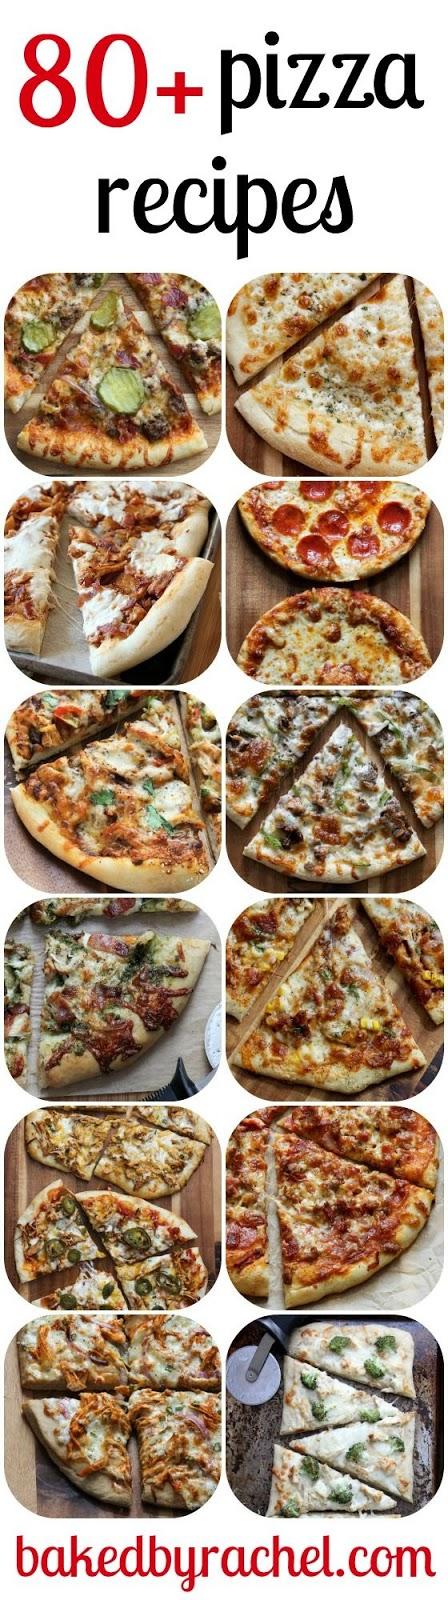 80 homemade pizza recipes